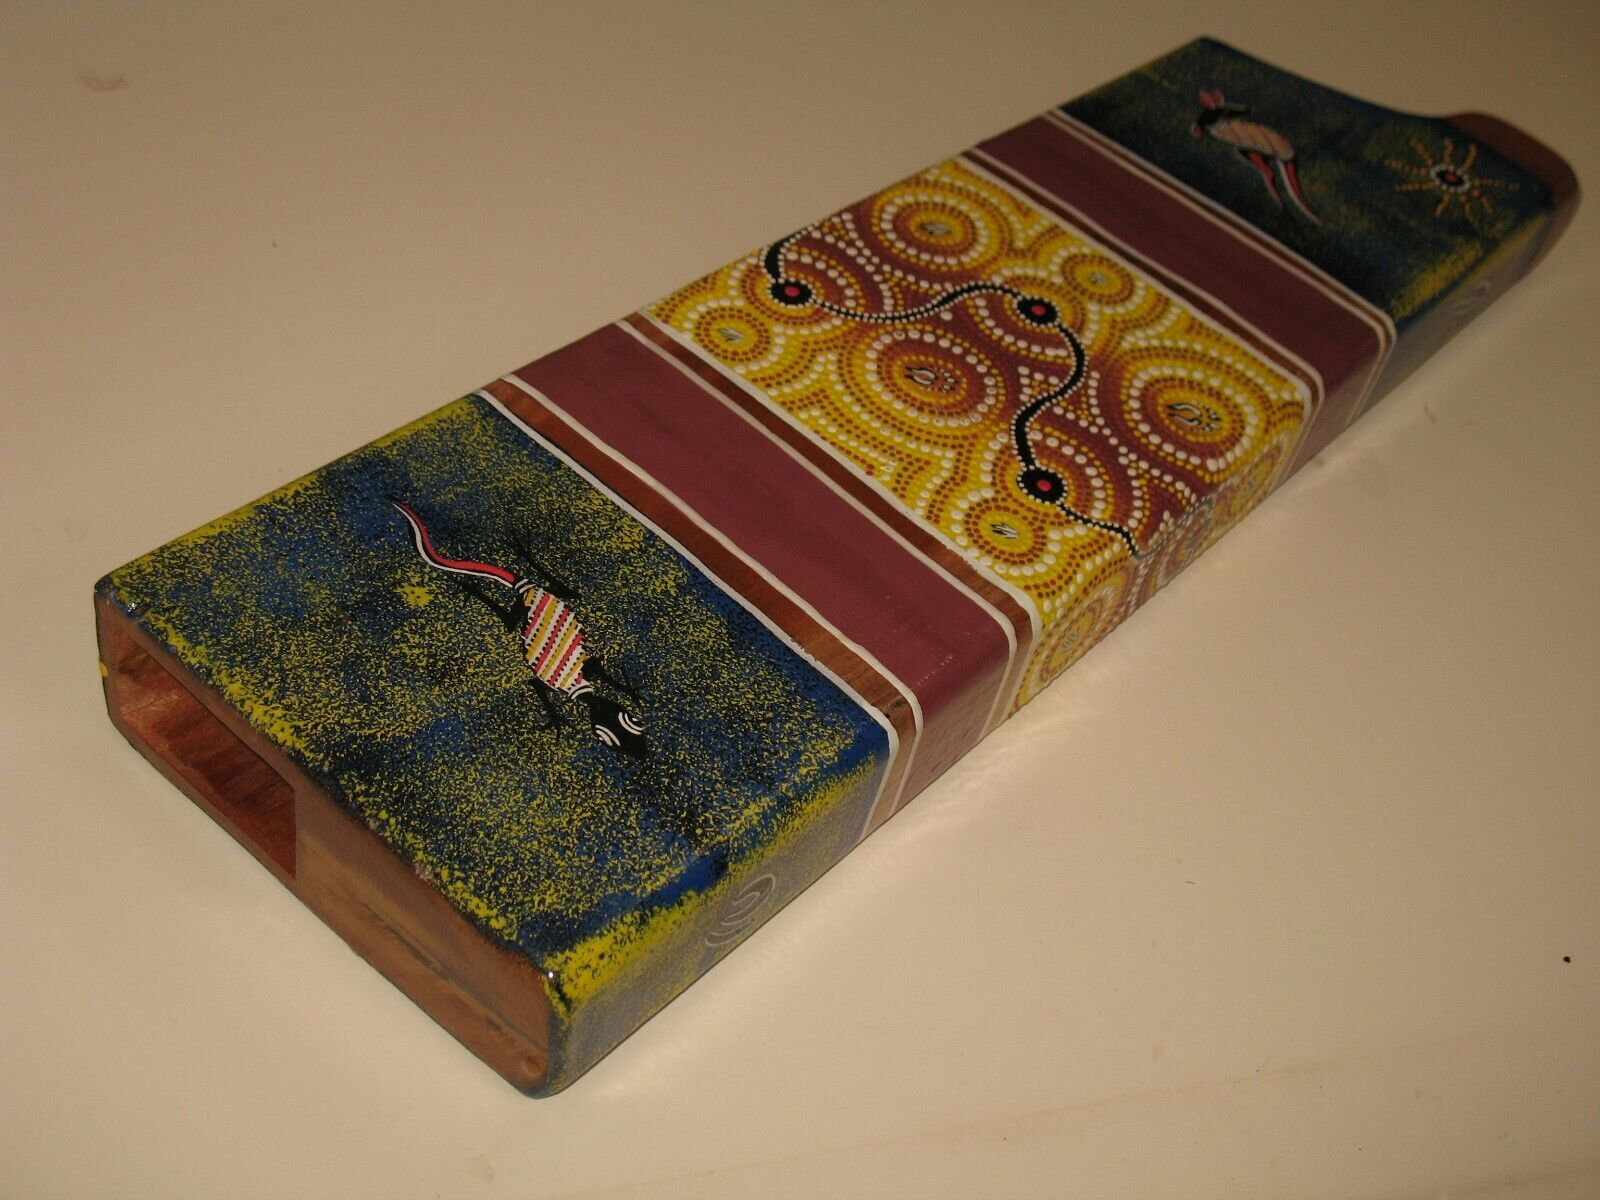 Mit Aesthetic Fault Verpackung Didgeridoo Dot-Painted Mahagoniholz Reise Kompakt